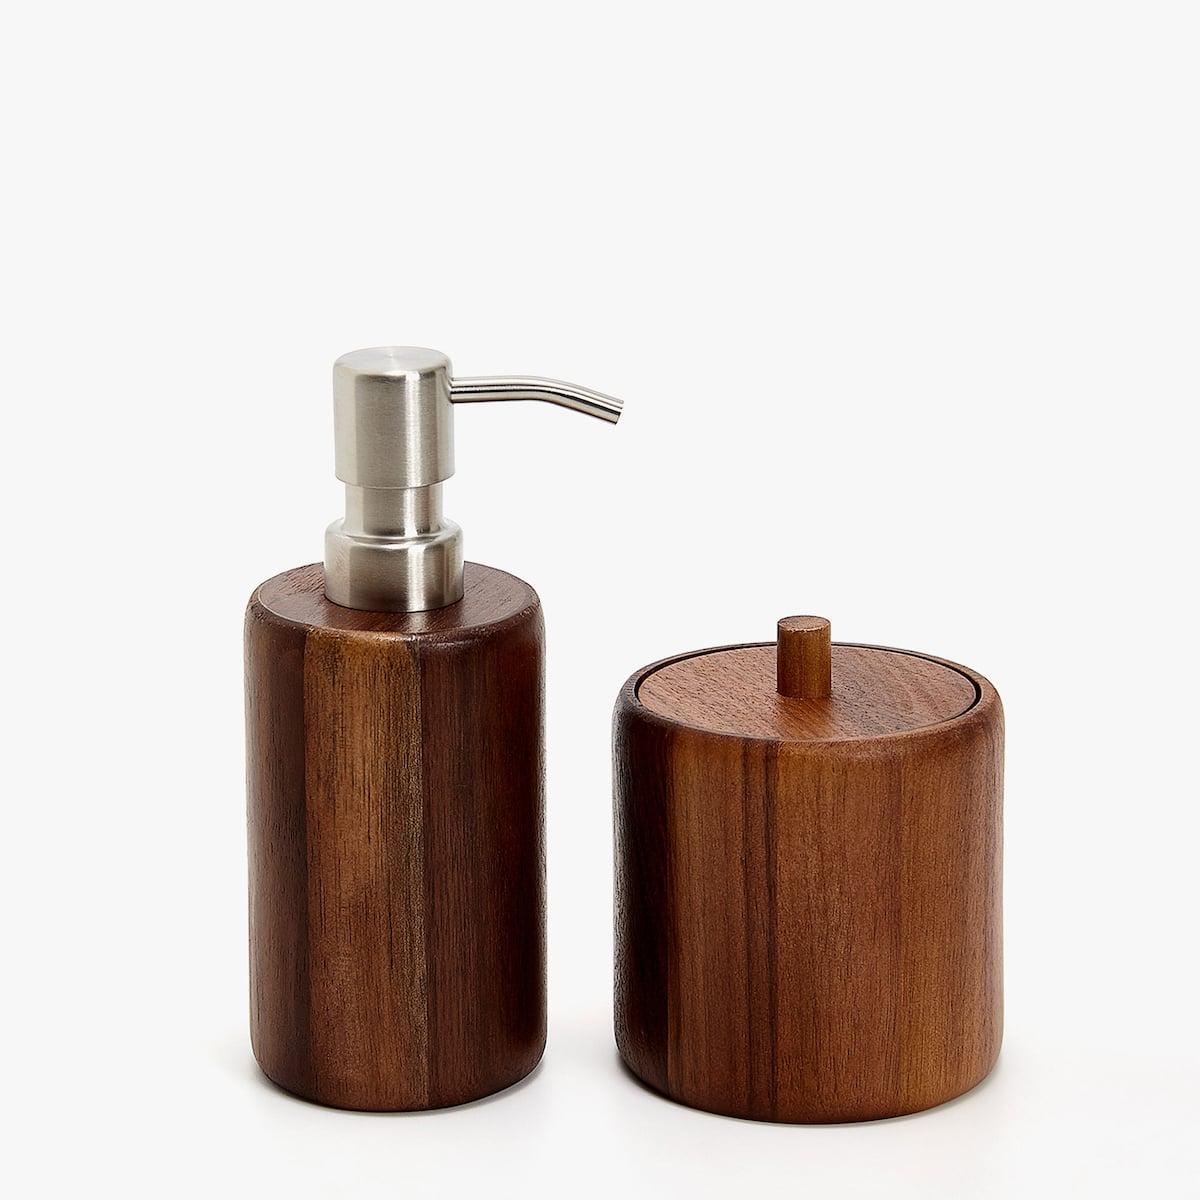 image 6 of the product dark wood dispenser - Wooden Bathroom Accessories Uk